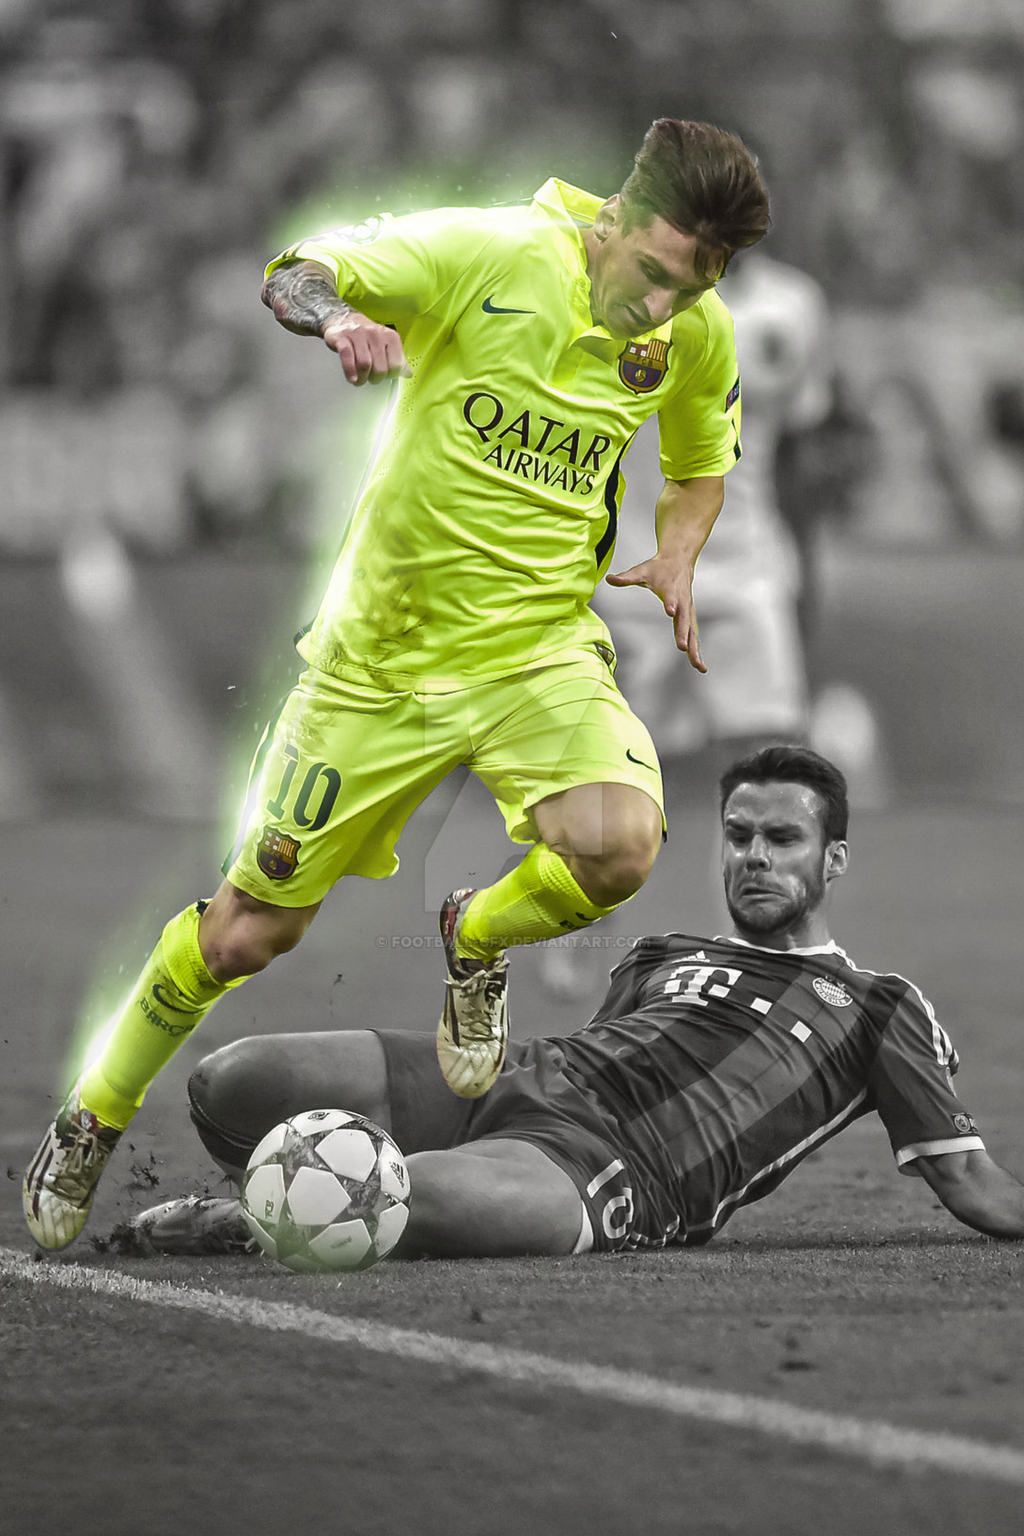 Images Lionel Messi Wallpaper 2015